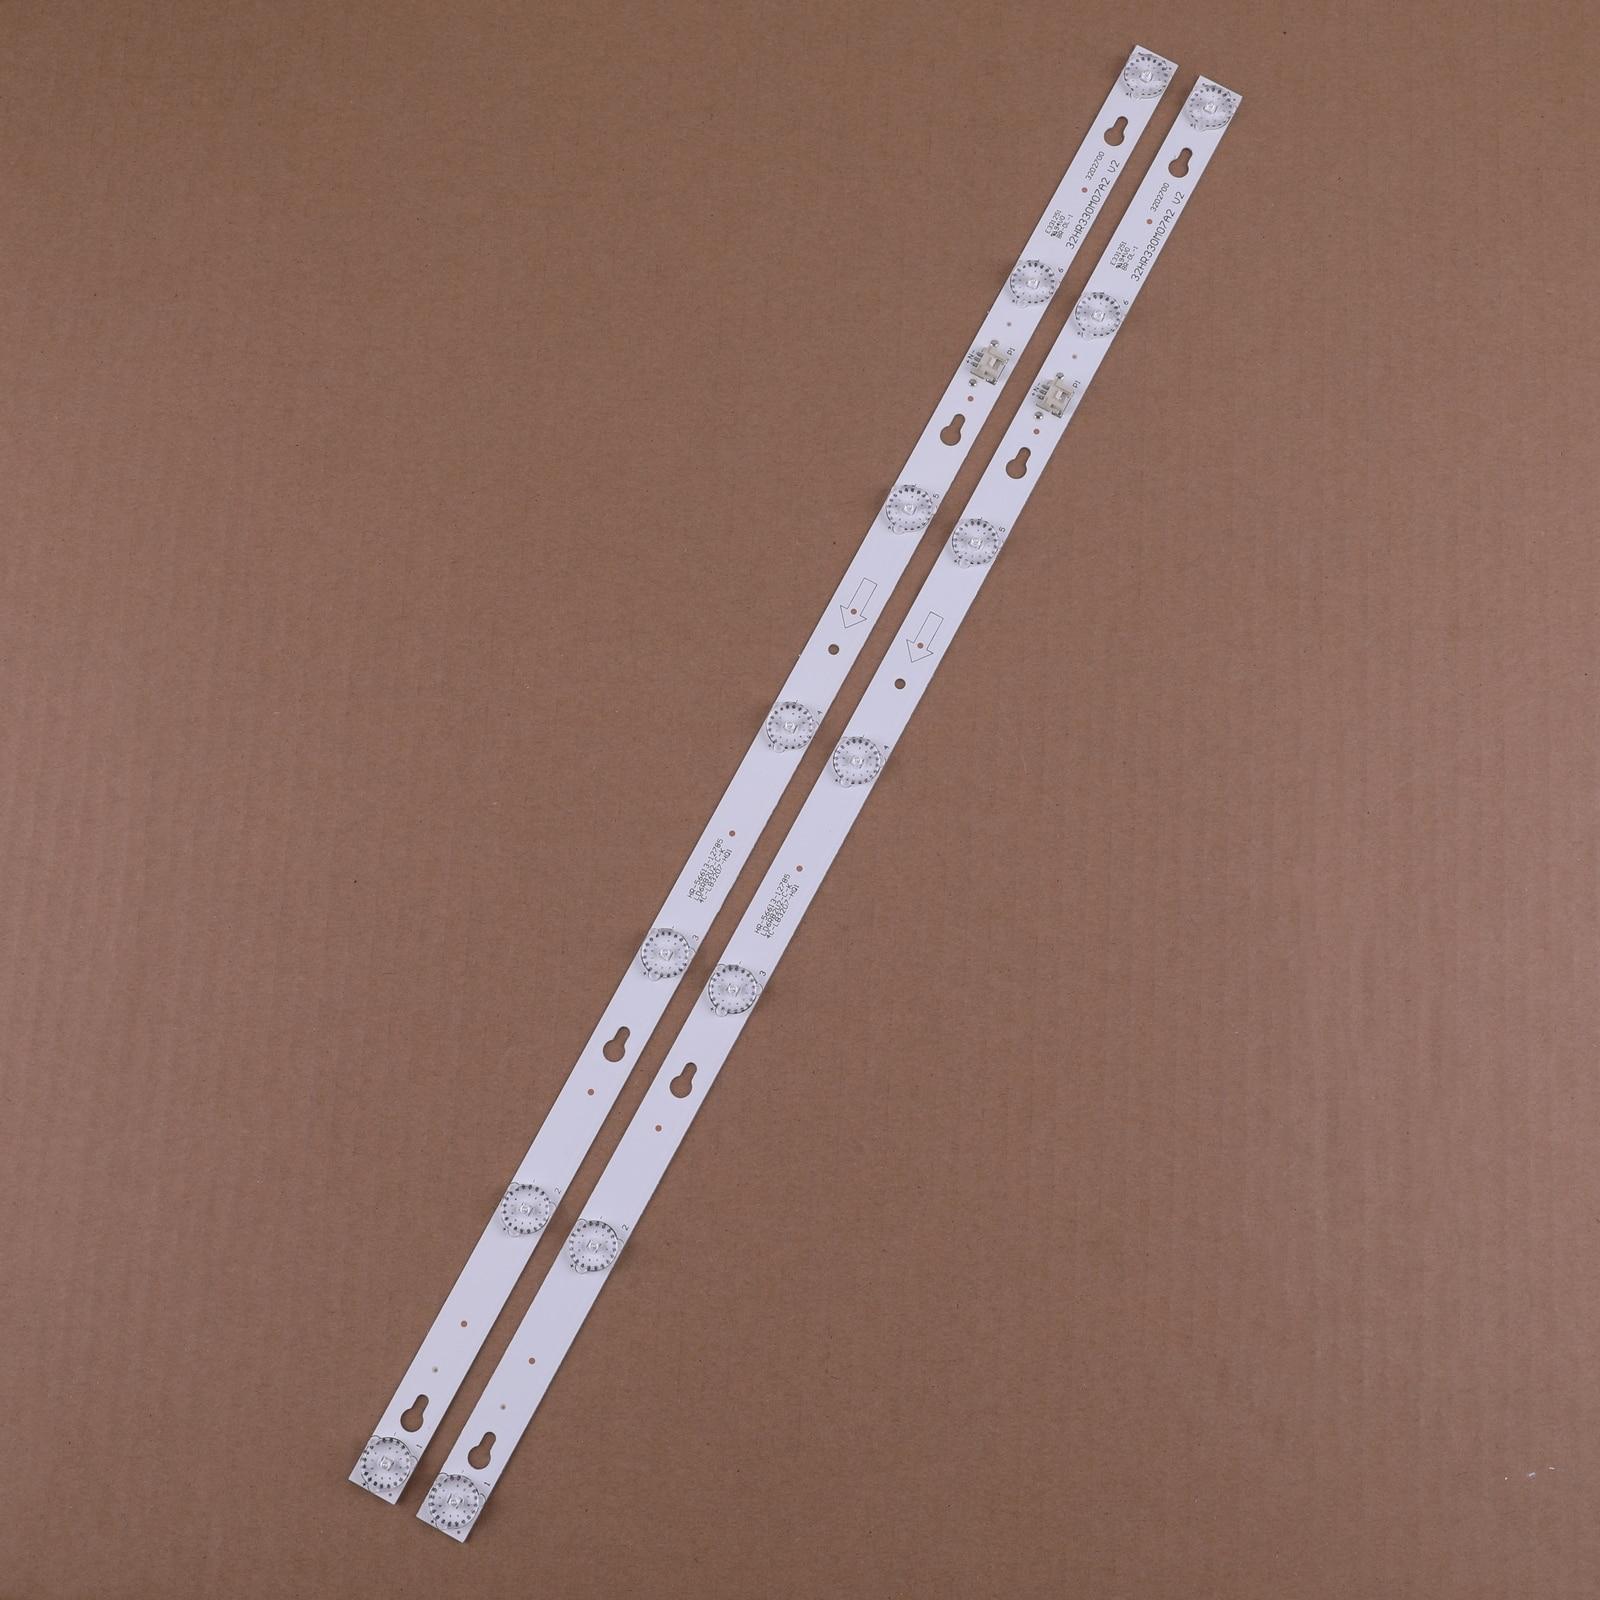 1 Conjunto = 2 uds LED lámpara de luz de fondo de para TCL L32F3303B 32HR330M07A2 TCL L32F3303B M18 para merlot 32M19 32M18